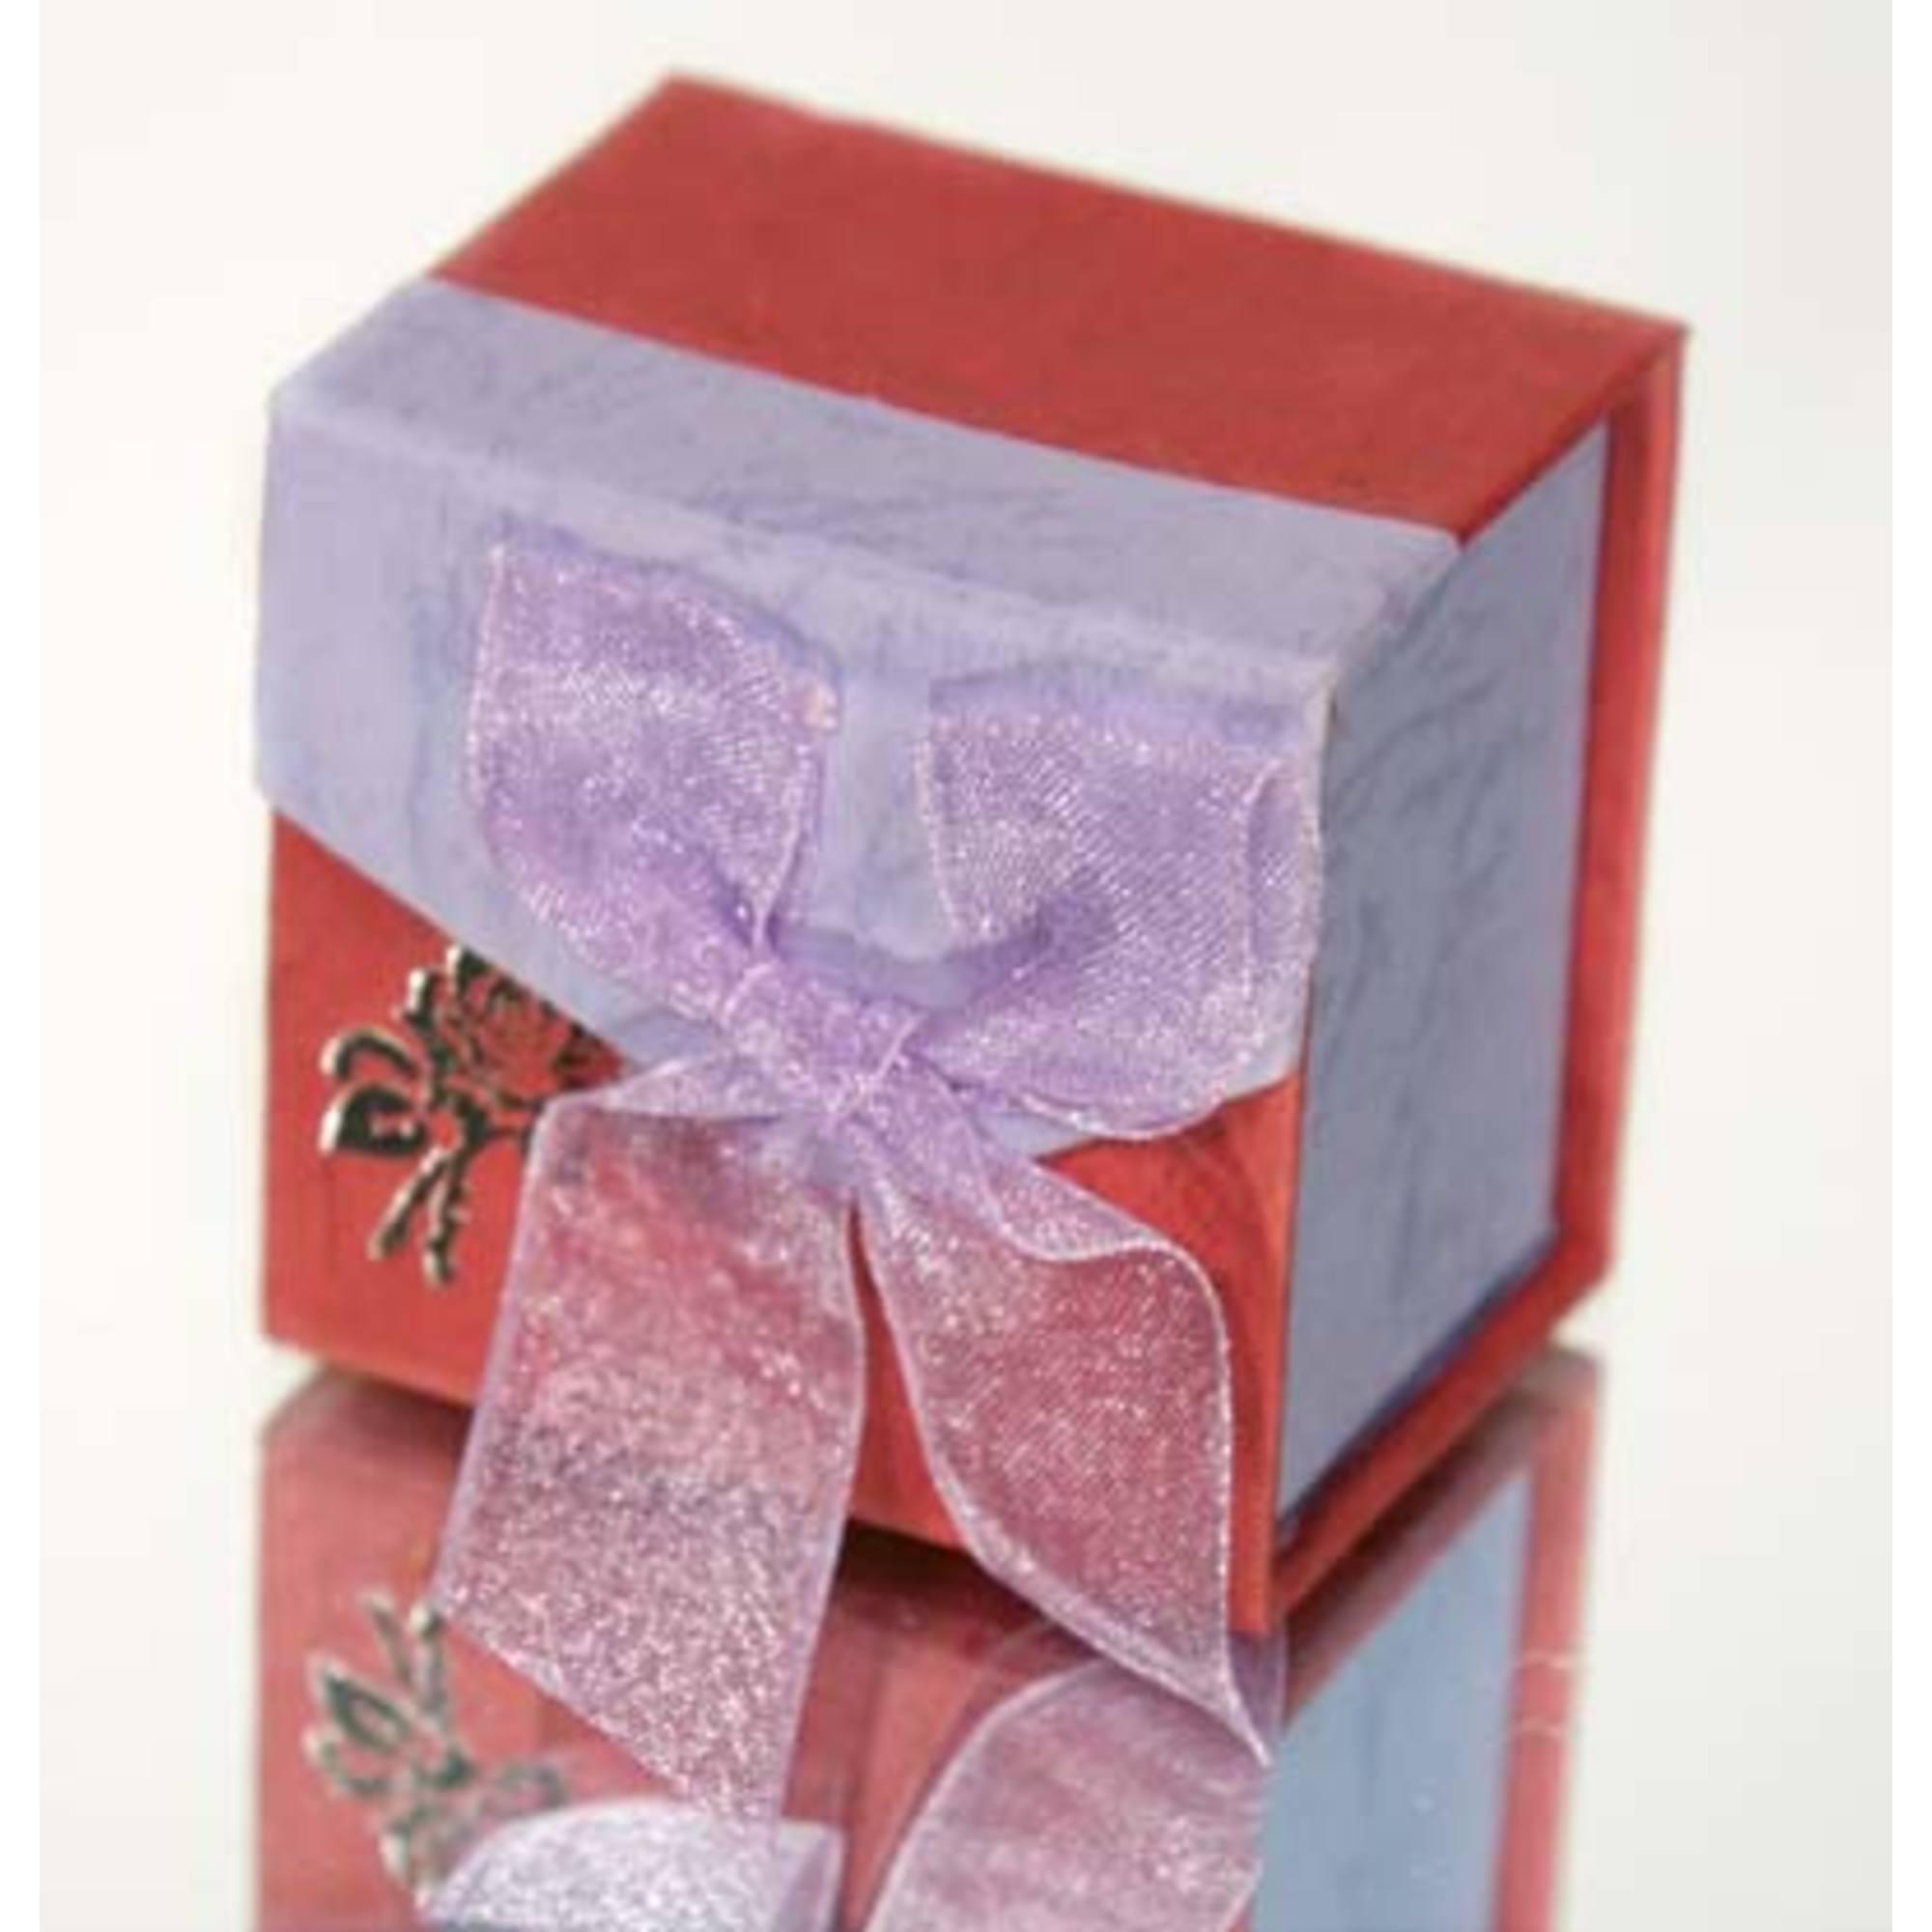 Jewellery Gift Box - Red